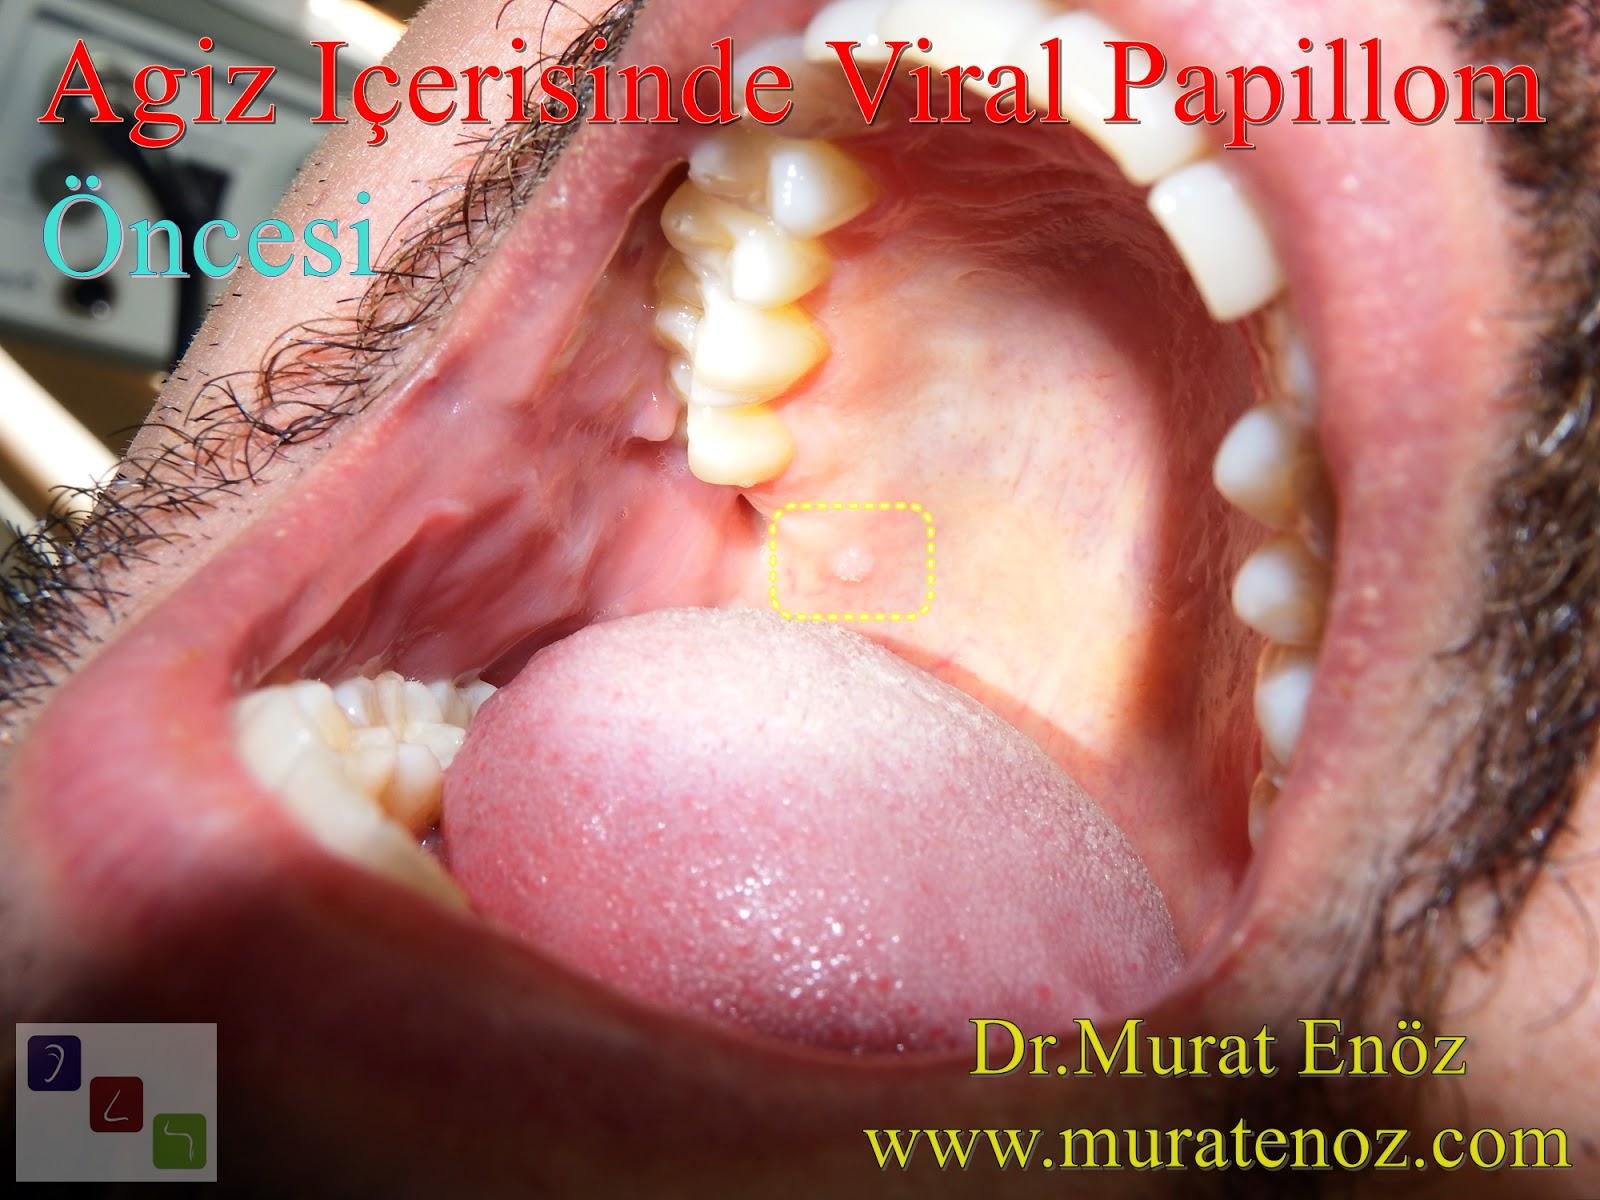 humán papillomavírus belirtileri